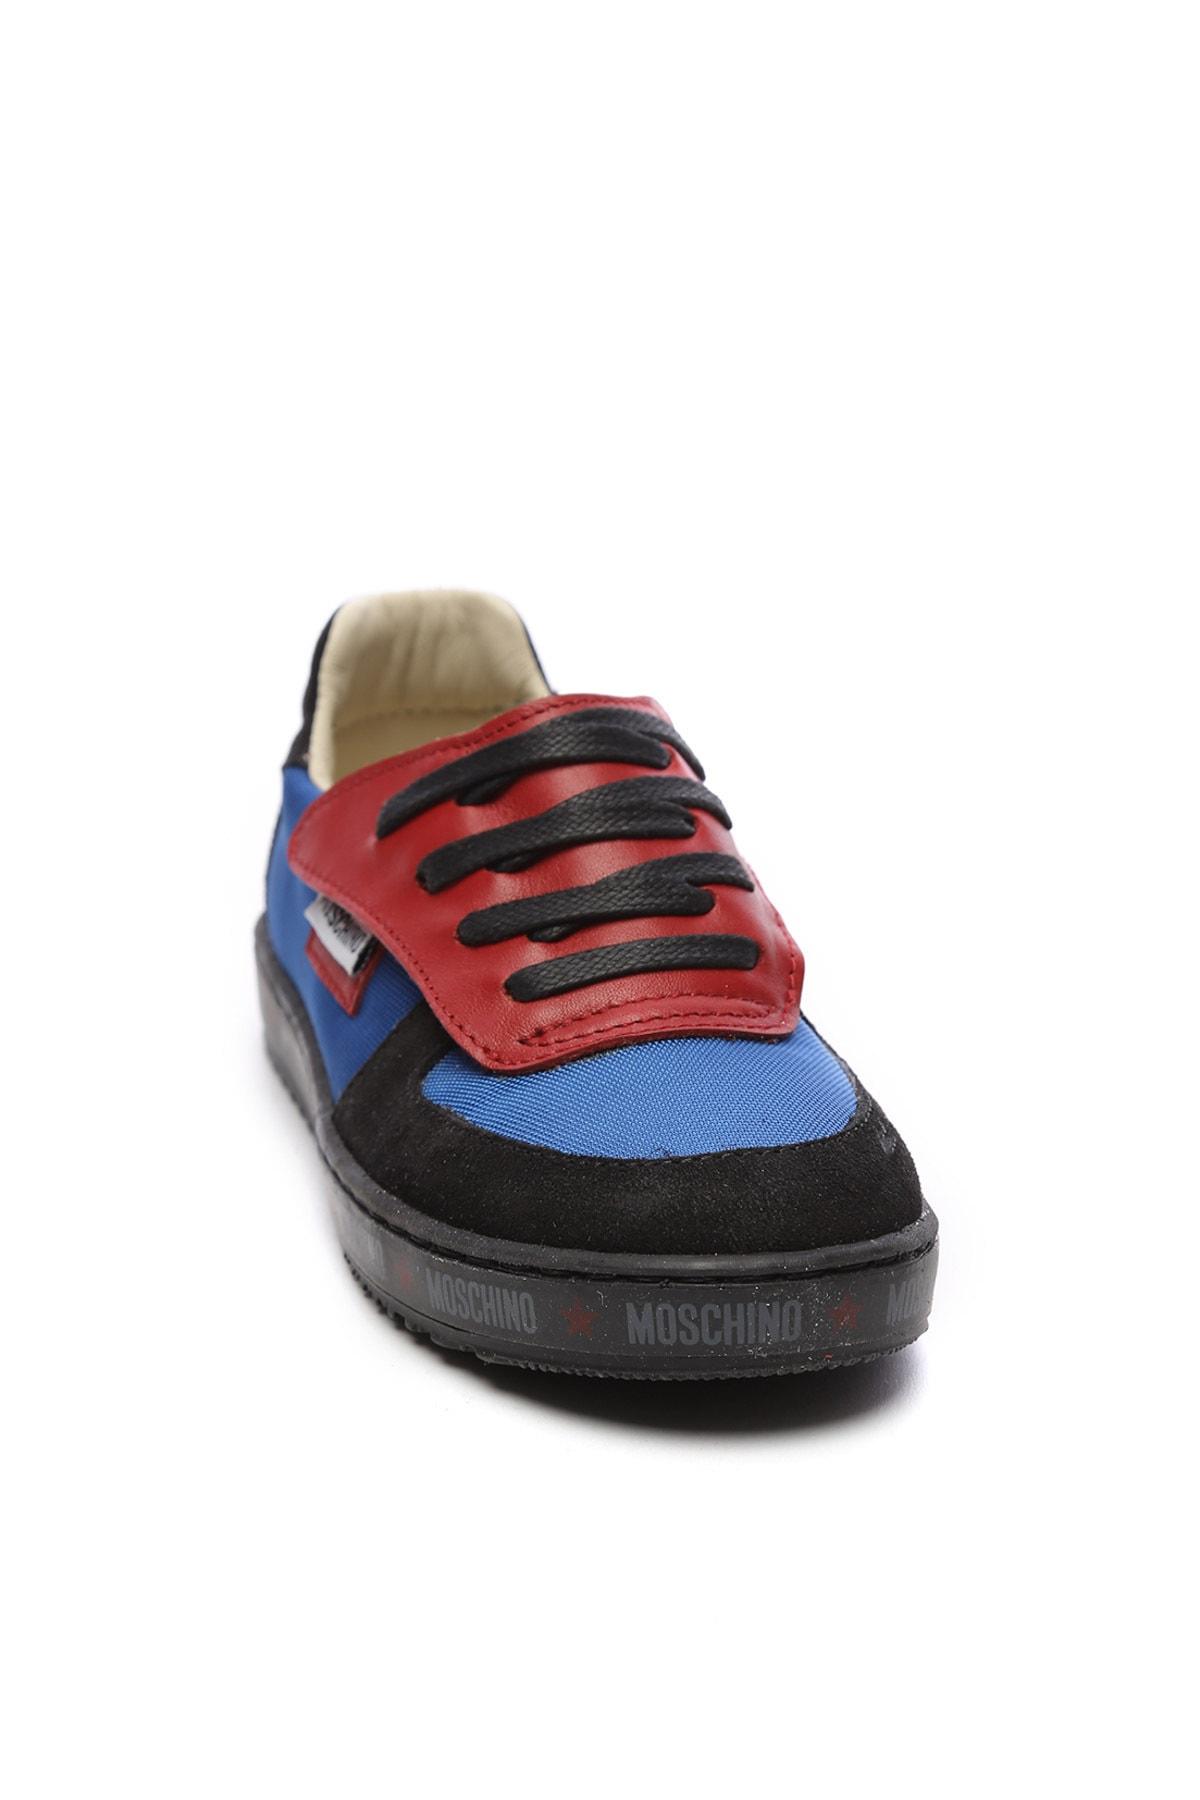 Moschino Çocuk Derı Spor Ayakkabı 104 25540 COCUK PATIK 2